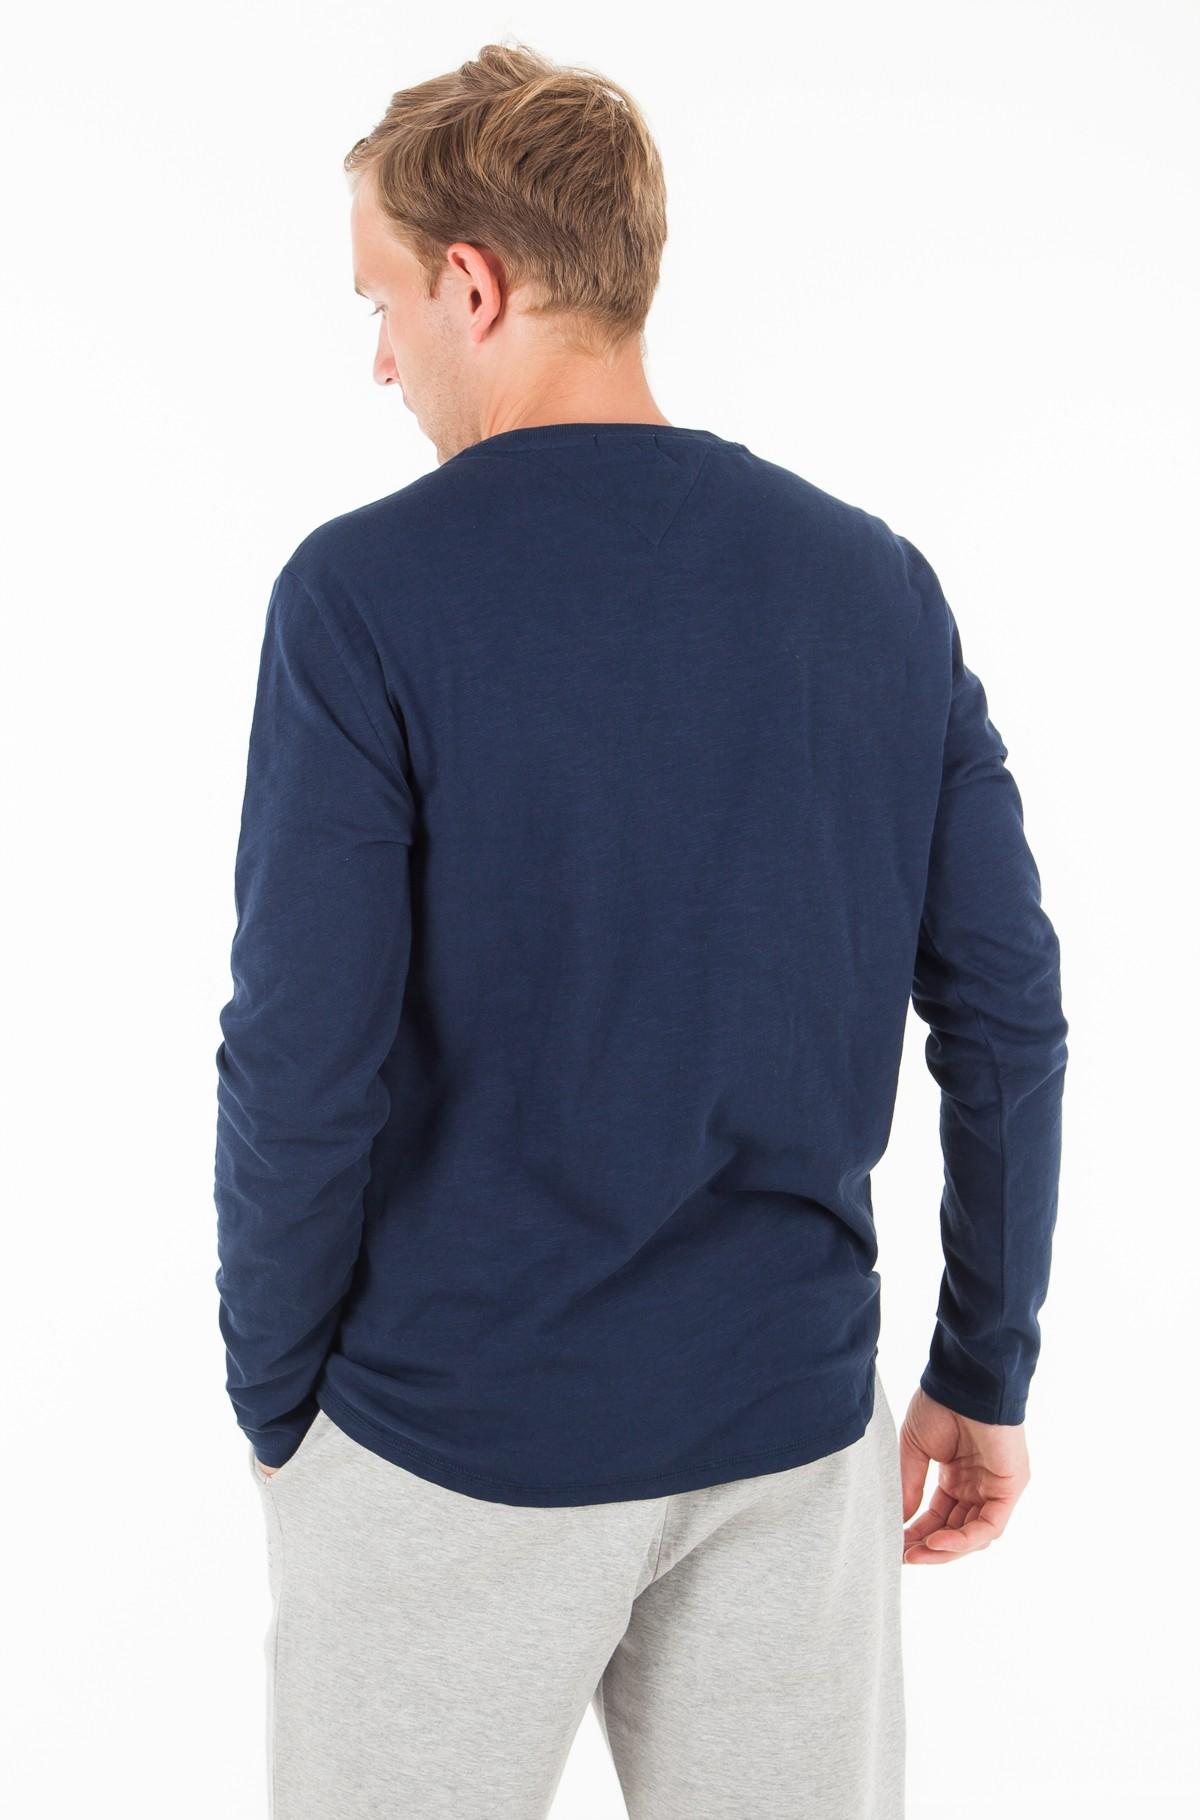 T-krekls ar garām piedurknēm  TJM SLUB LONG SLEEVE TEE-full-2